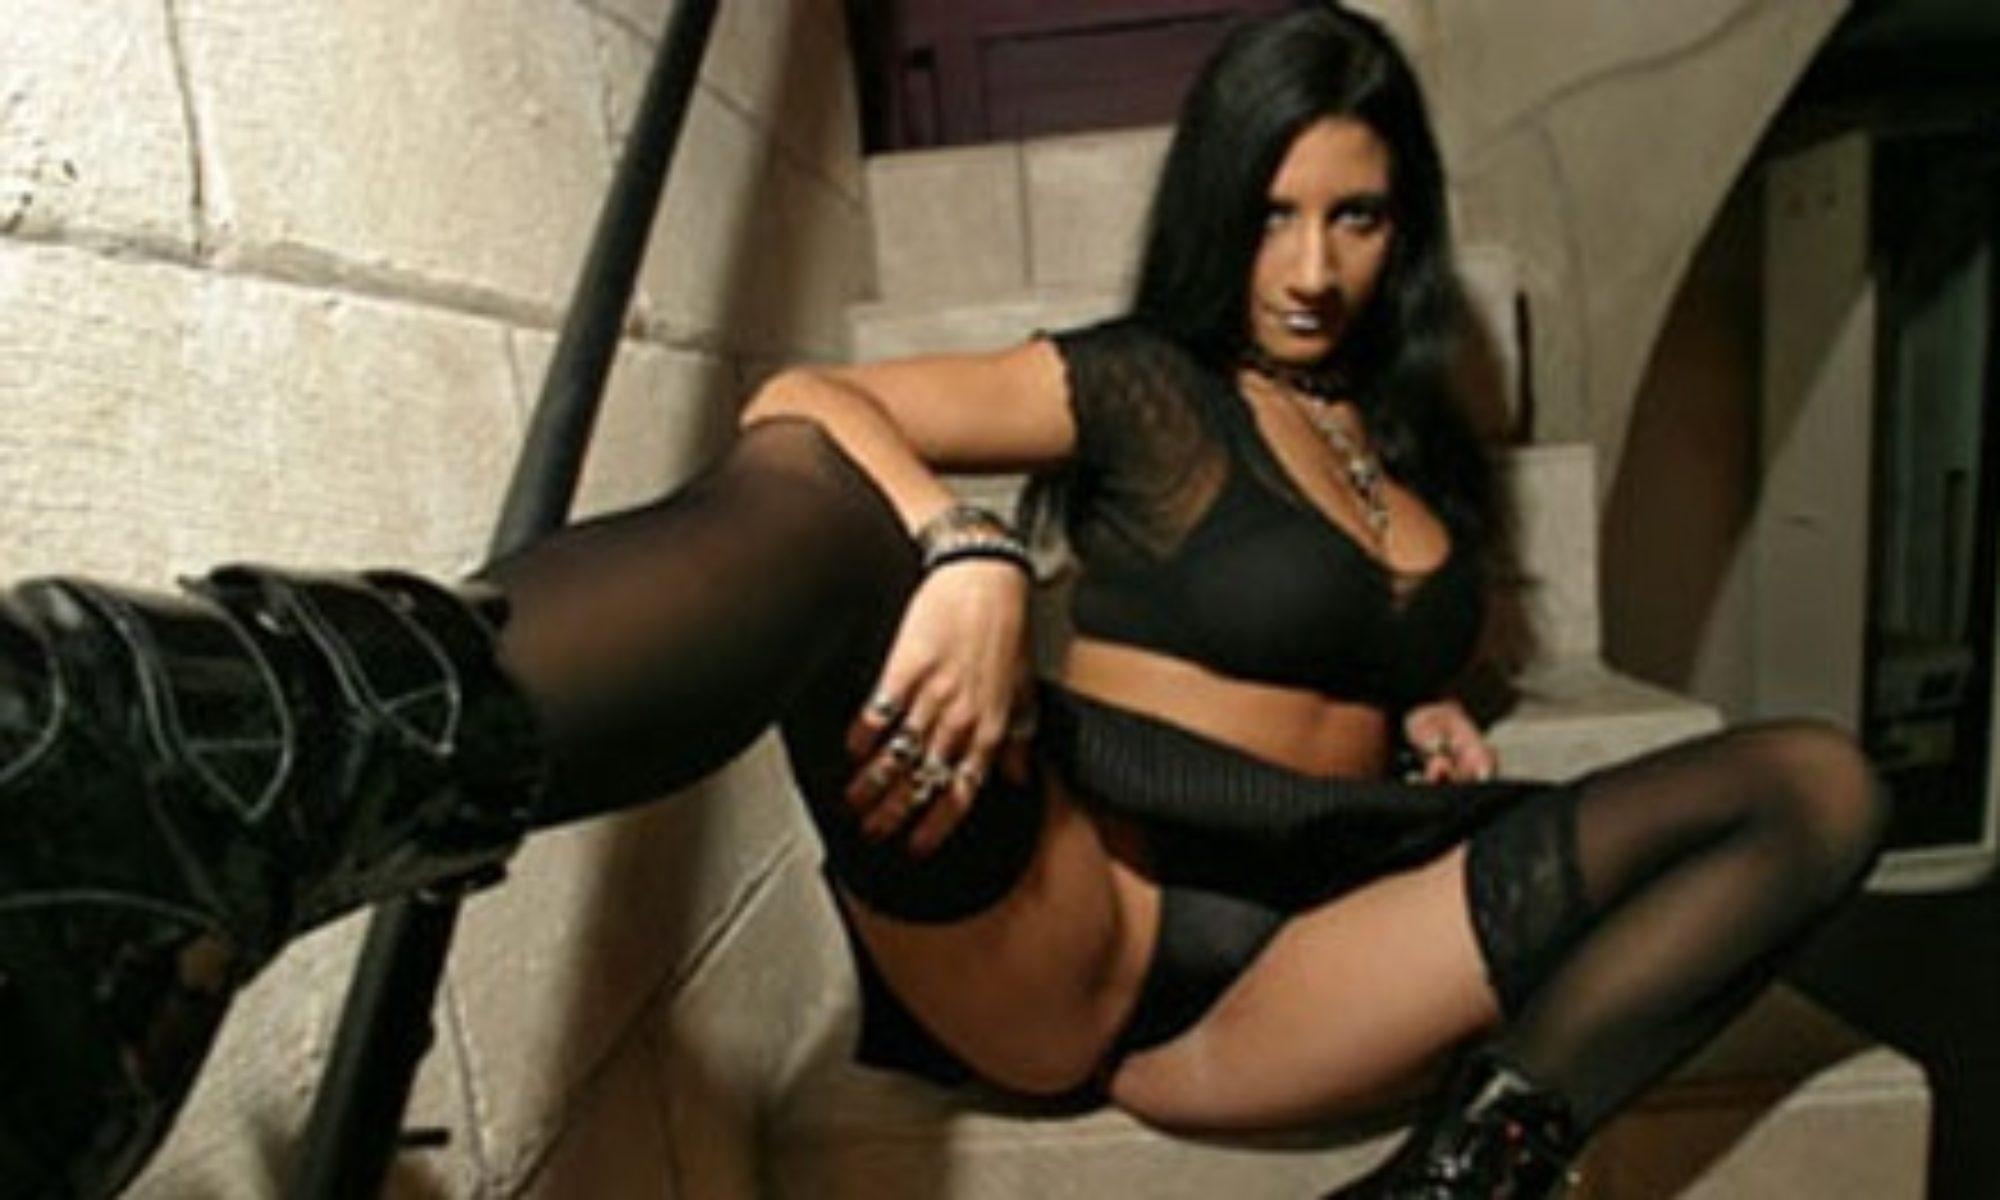 Mistress Intensity